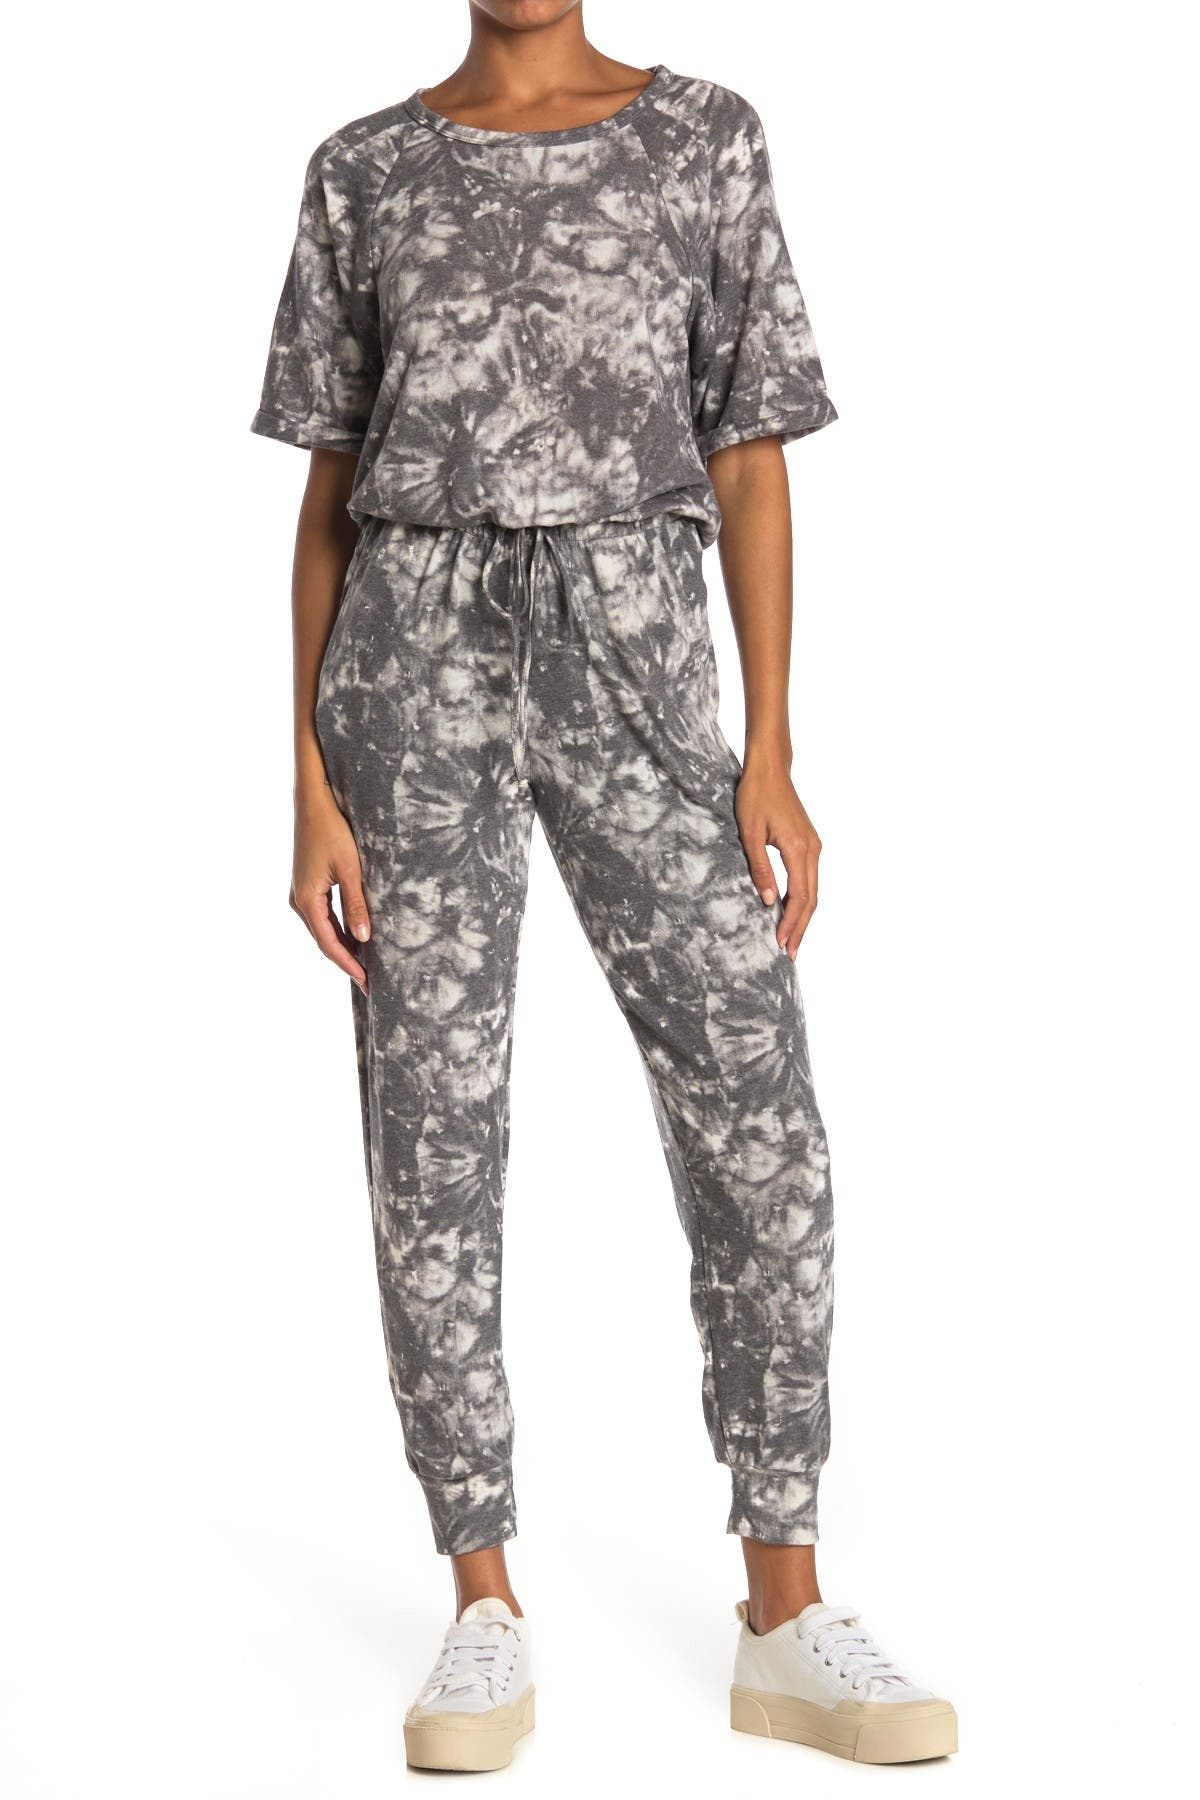 Image of Lush Printed Short Sleeve Jumpsuit